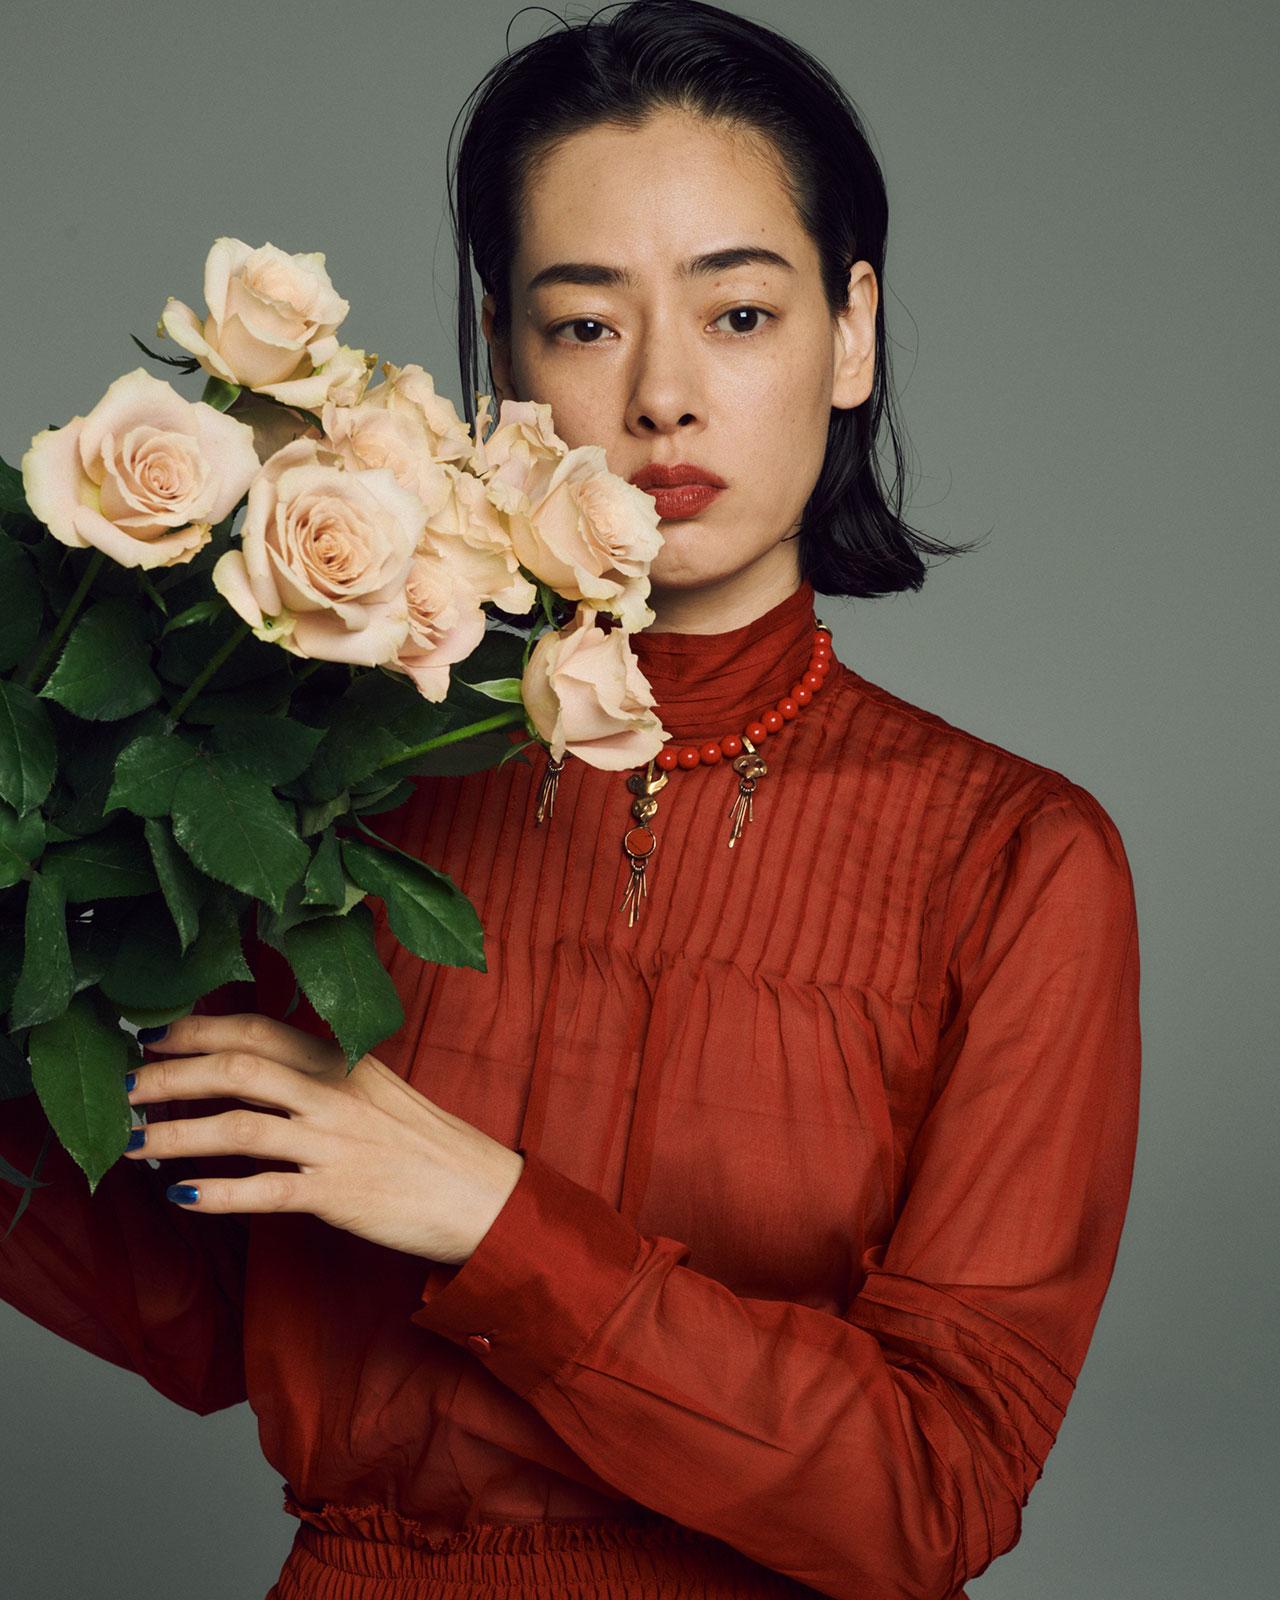 <Creative Staff> Photographer: Mitsuo Okamoto | Stylist: Megumi Yoshida | Hair&Makeup: Hiroko Ishikawa <The Look includes>コート ¥845,000、シャツ ¥122,000、スカート ¥305,000、Valentino (ヴァレンティノ) | ブーツ ¥178,000 *参考価格、ネックレス ¥95,000、Valentino Garavani (ヴァレンティノ ガラヴァーニ)